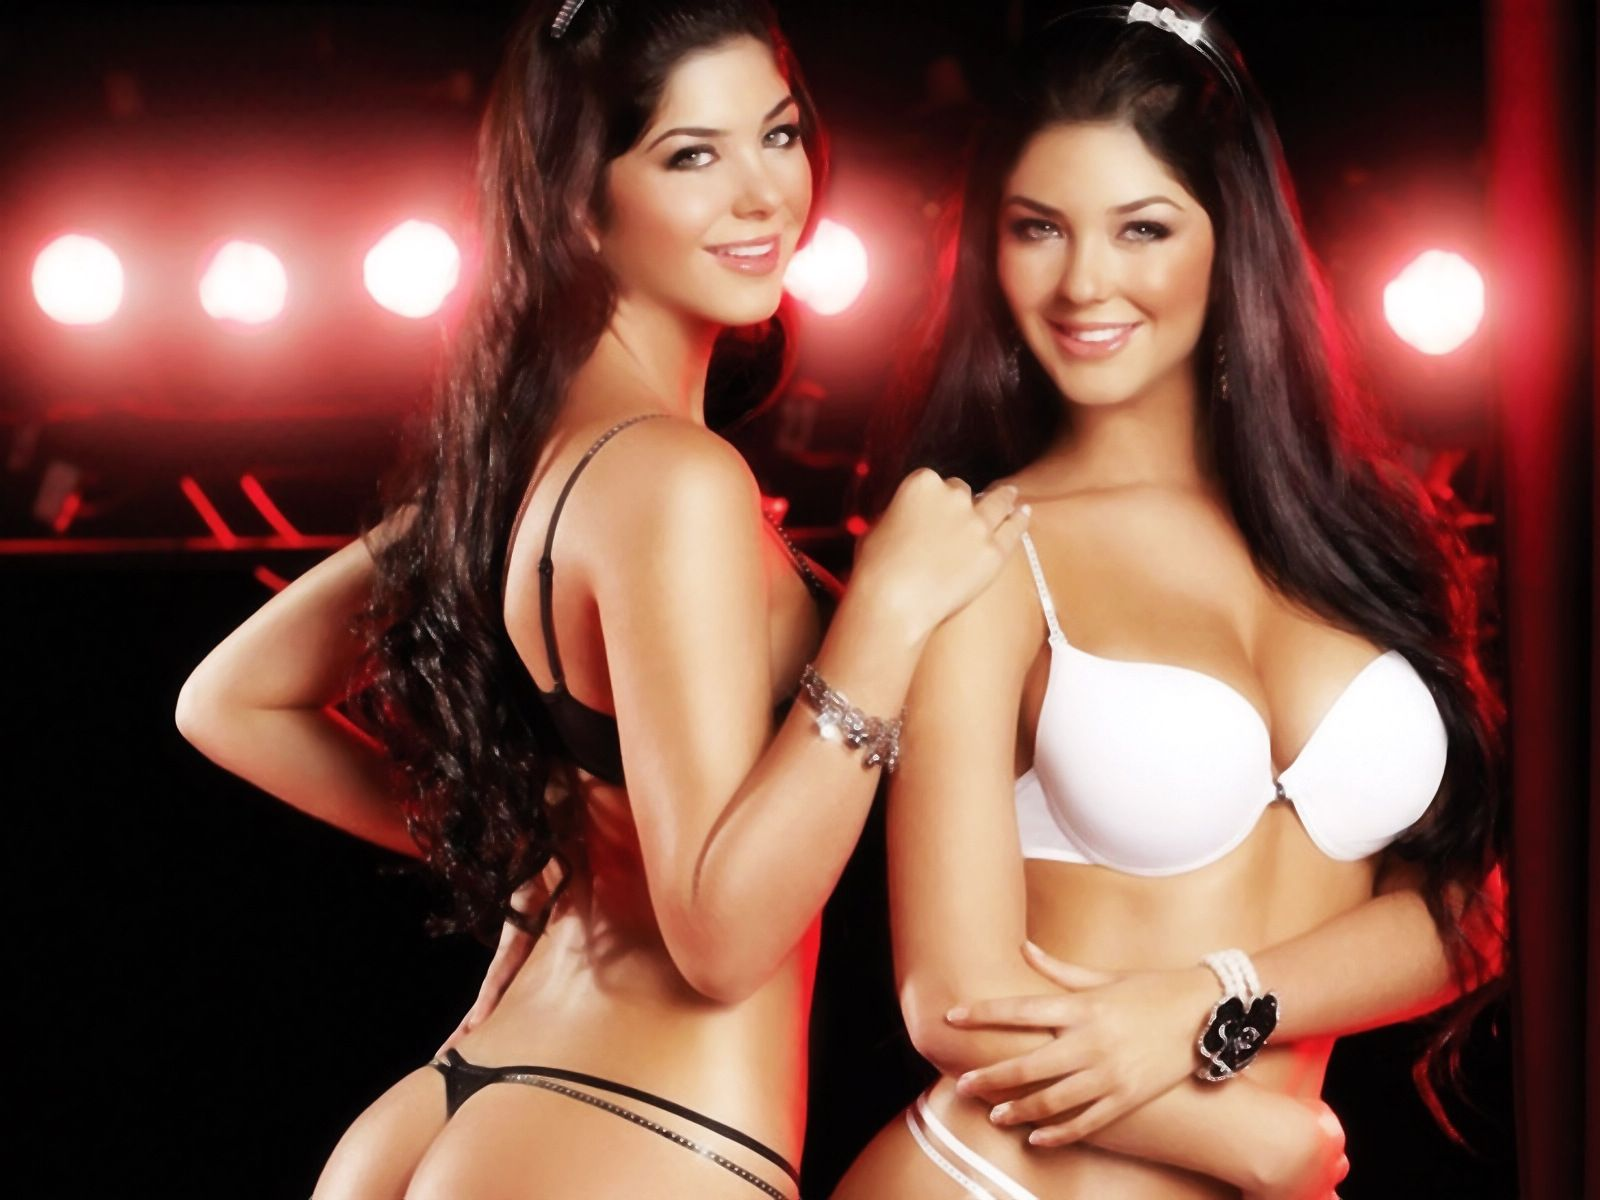 Sexy Hot Twin Girls Grace Faerie Chivette Rosa Best Blonde Ichive Gifs